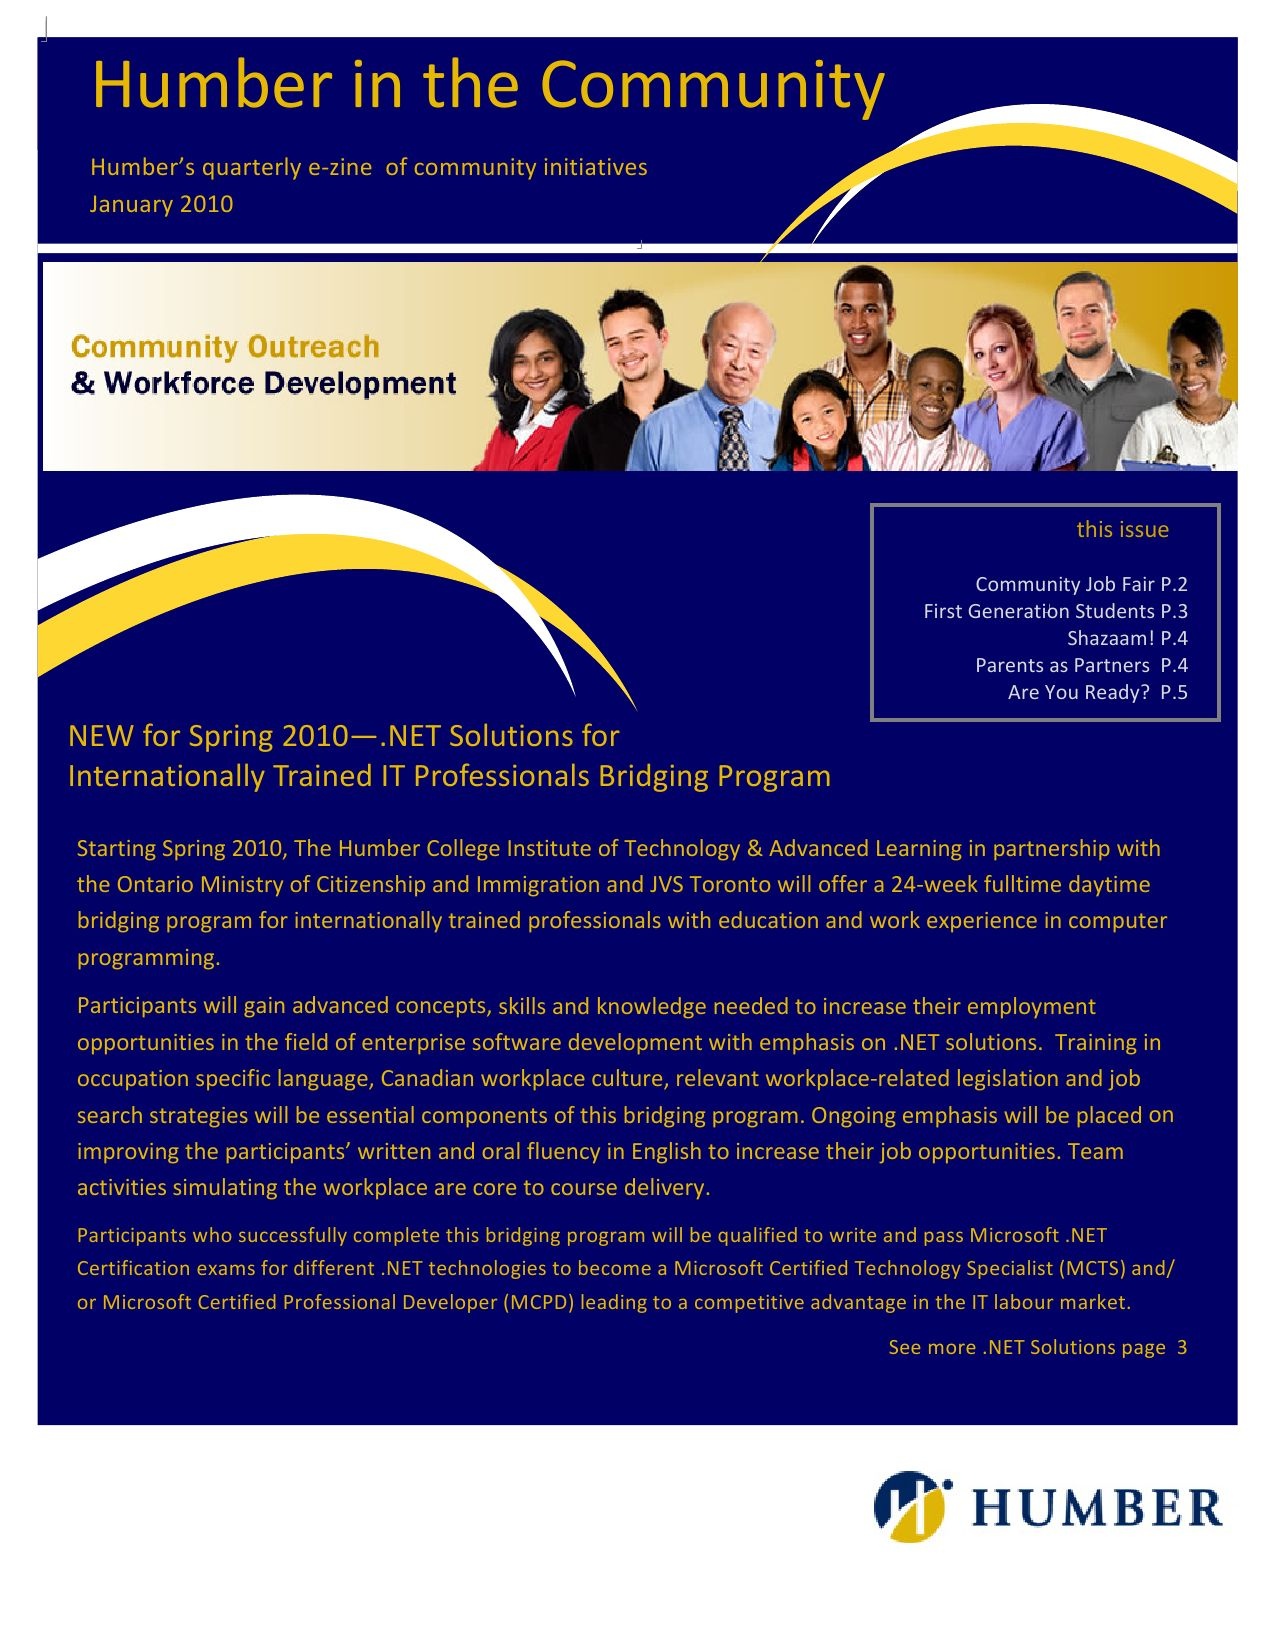 Humber Community Outreach Workforce Development January Newsletter